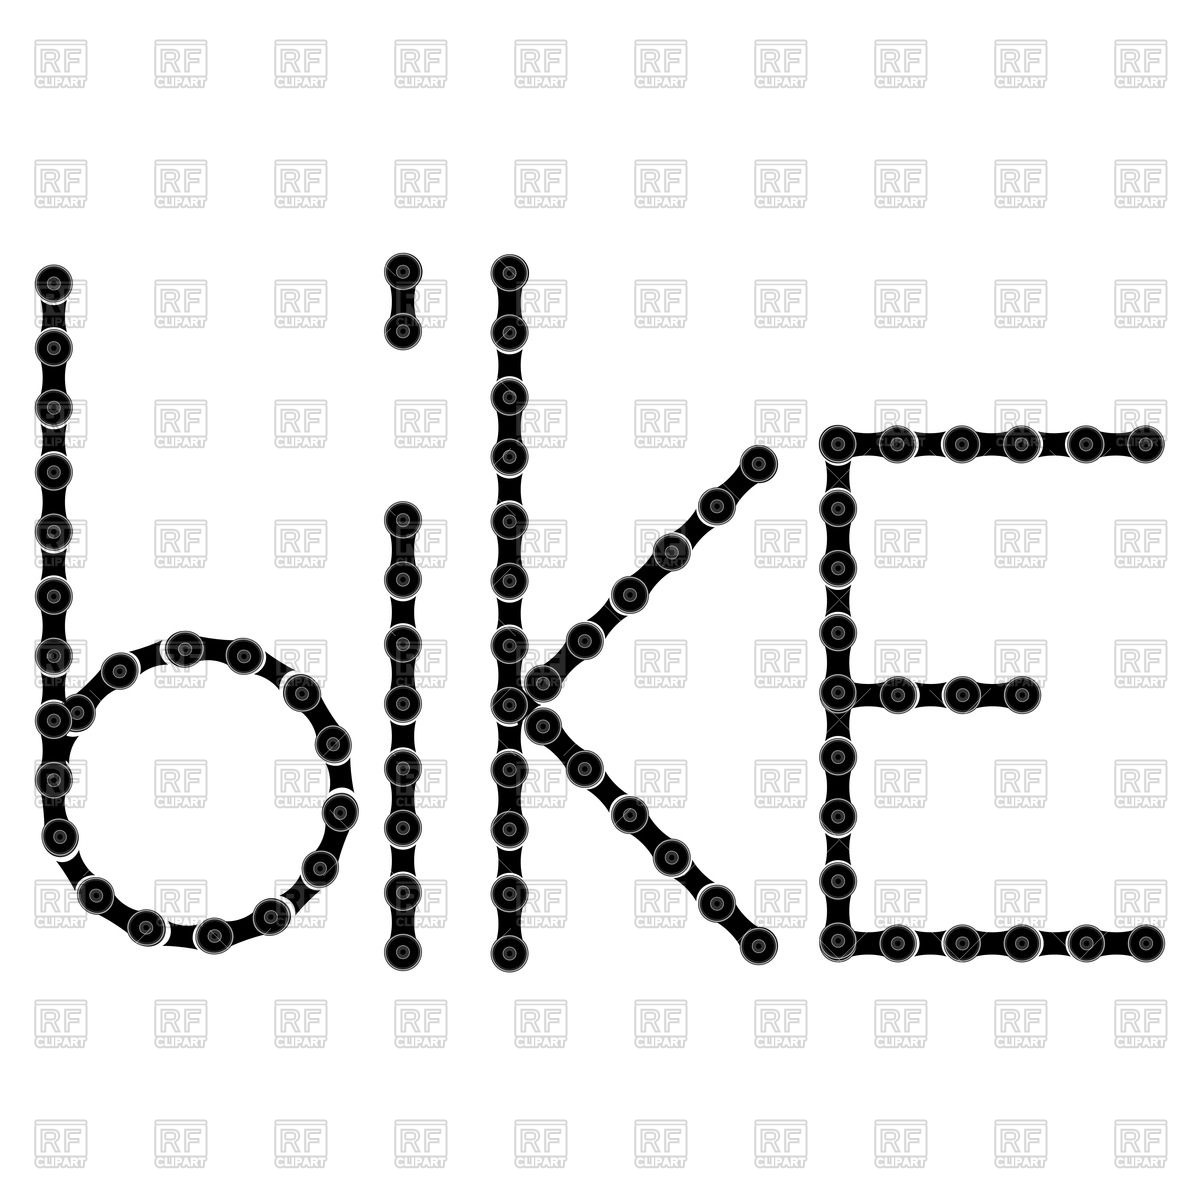 1200x1200 Chain Text Bike Vector Image Vector Artwork Of Design Elements